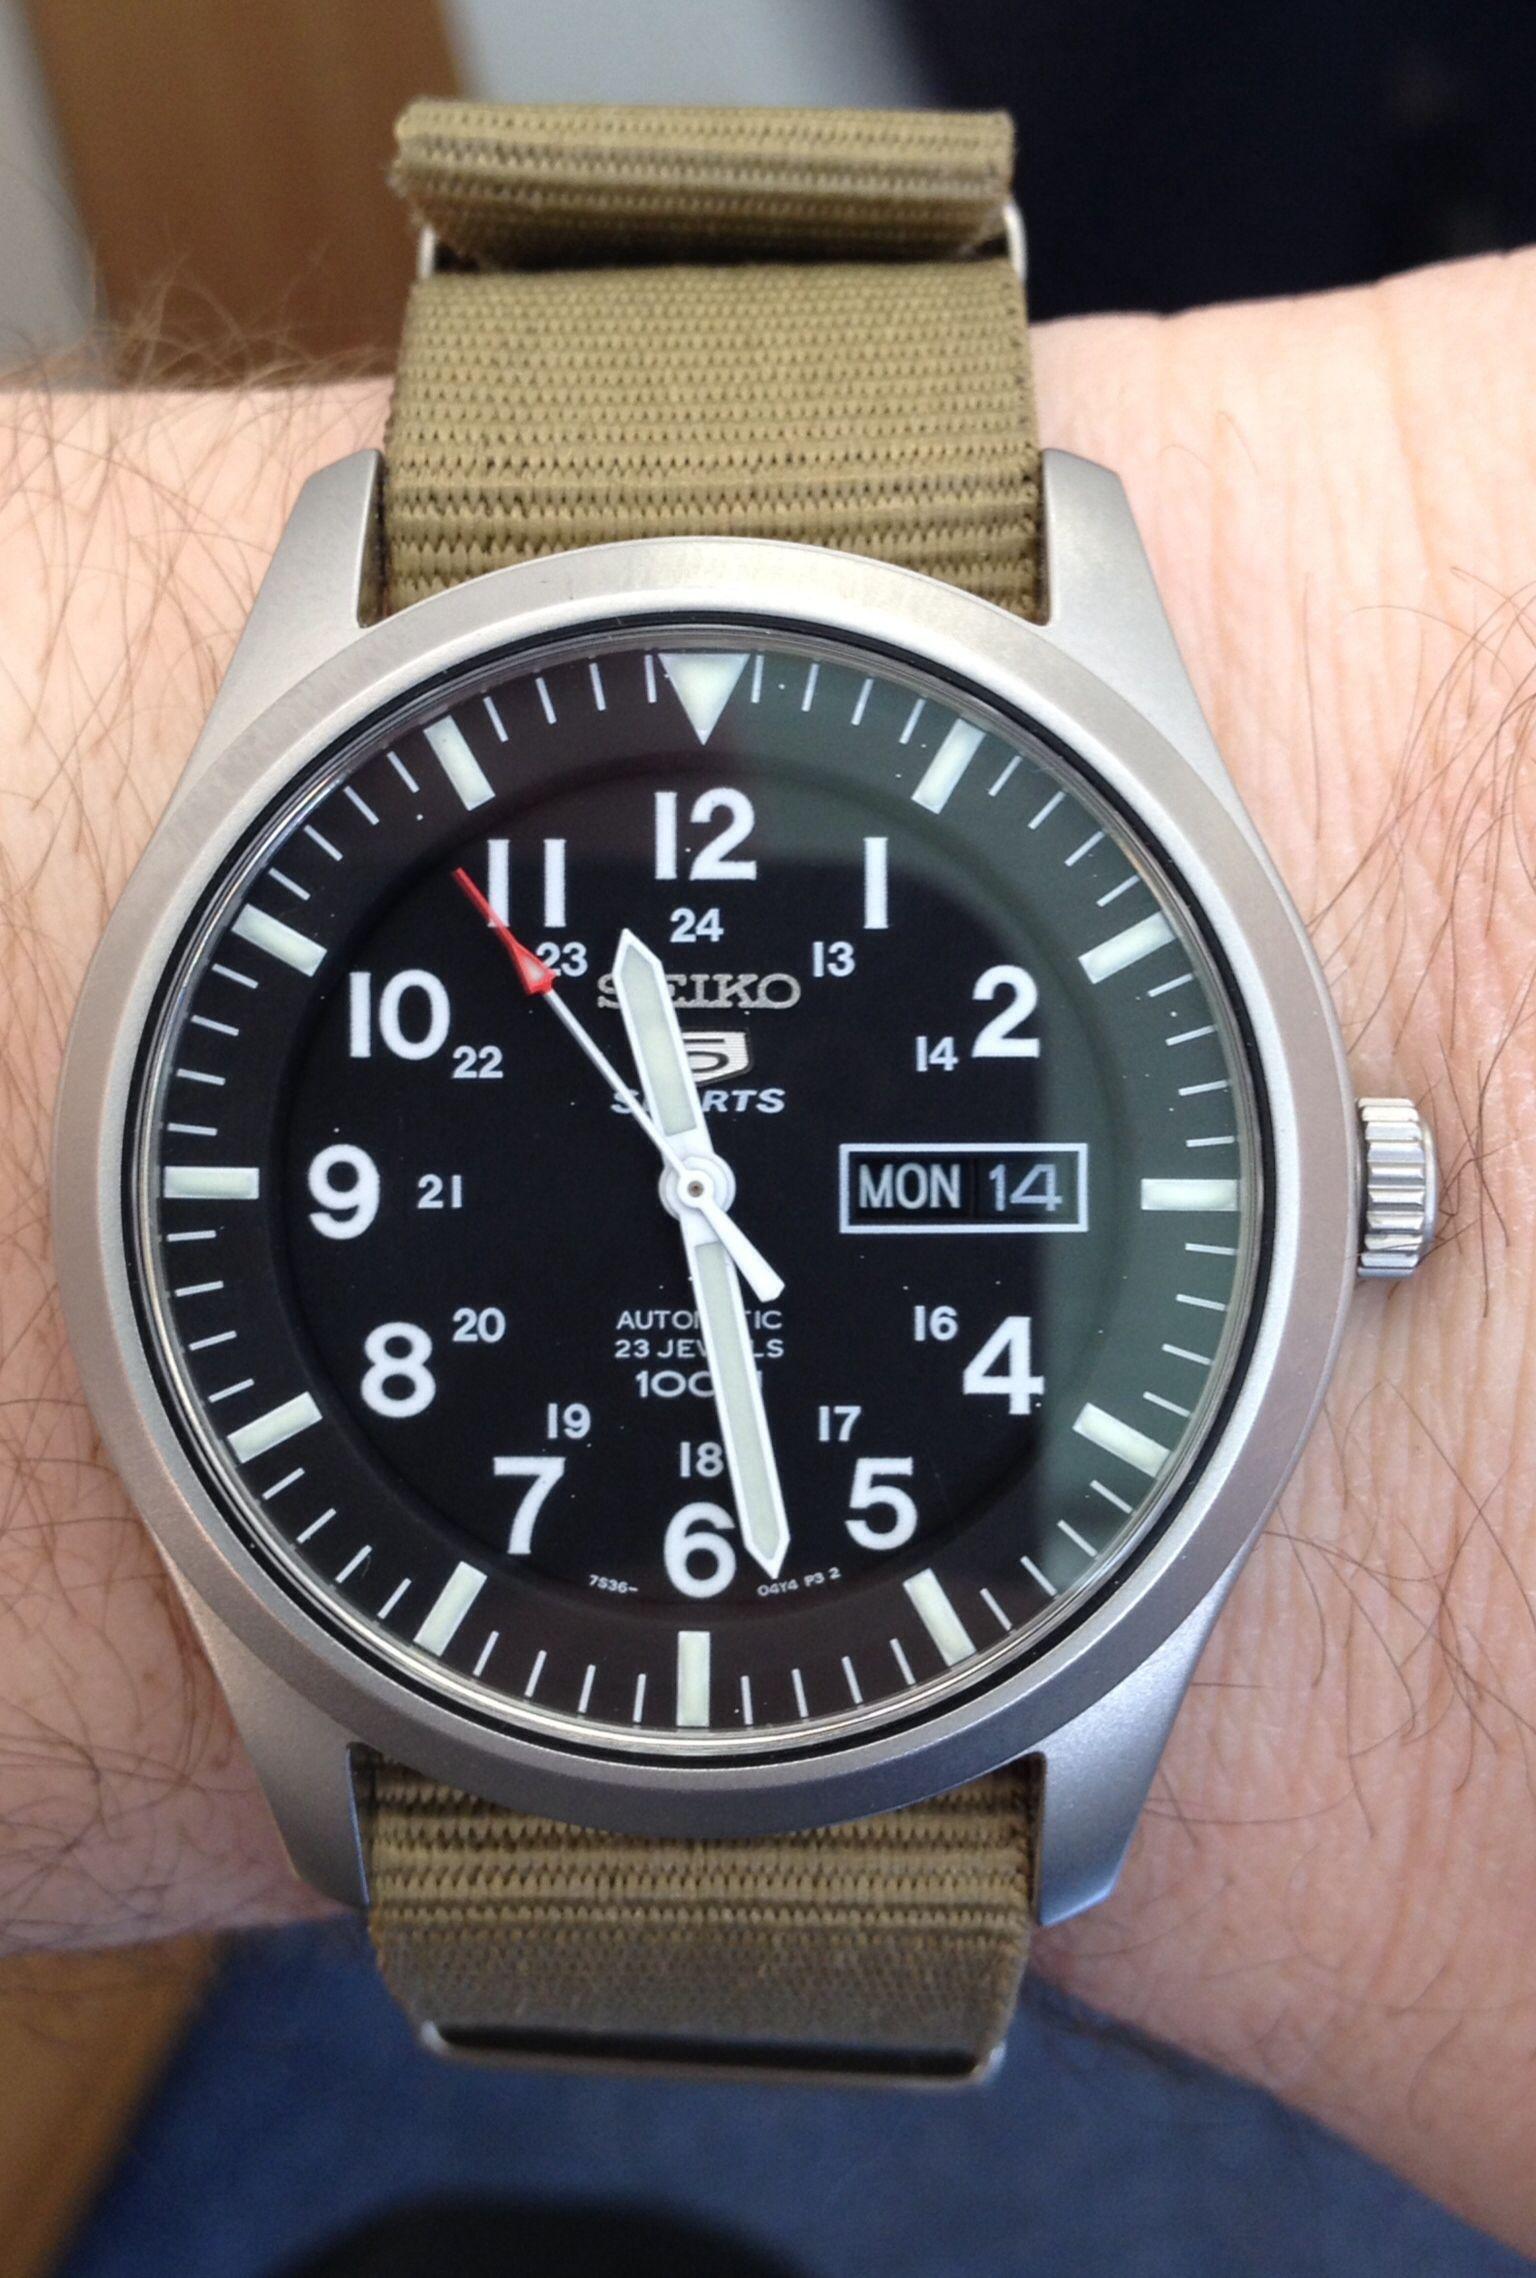 23 Jewel Seiko 7S36 Movement Automatic Watch On A Khaki NATO Style Strap